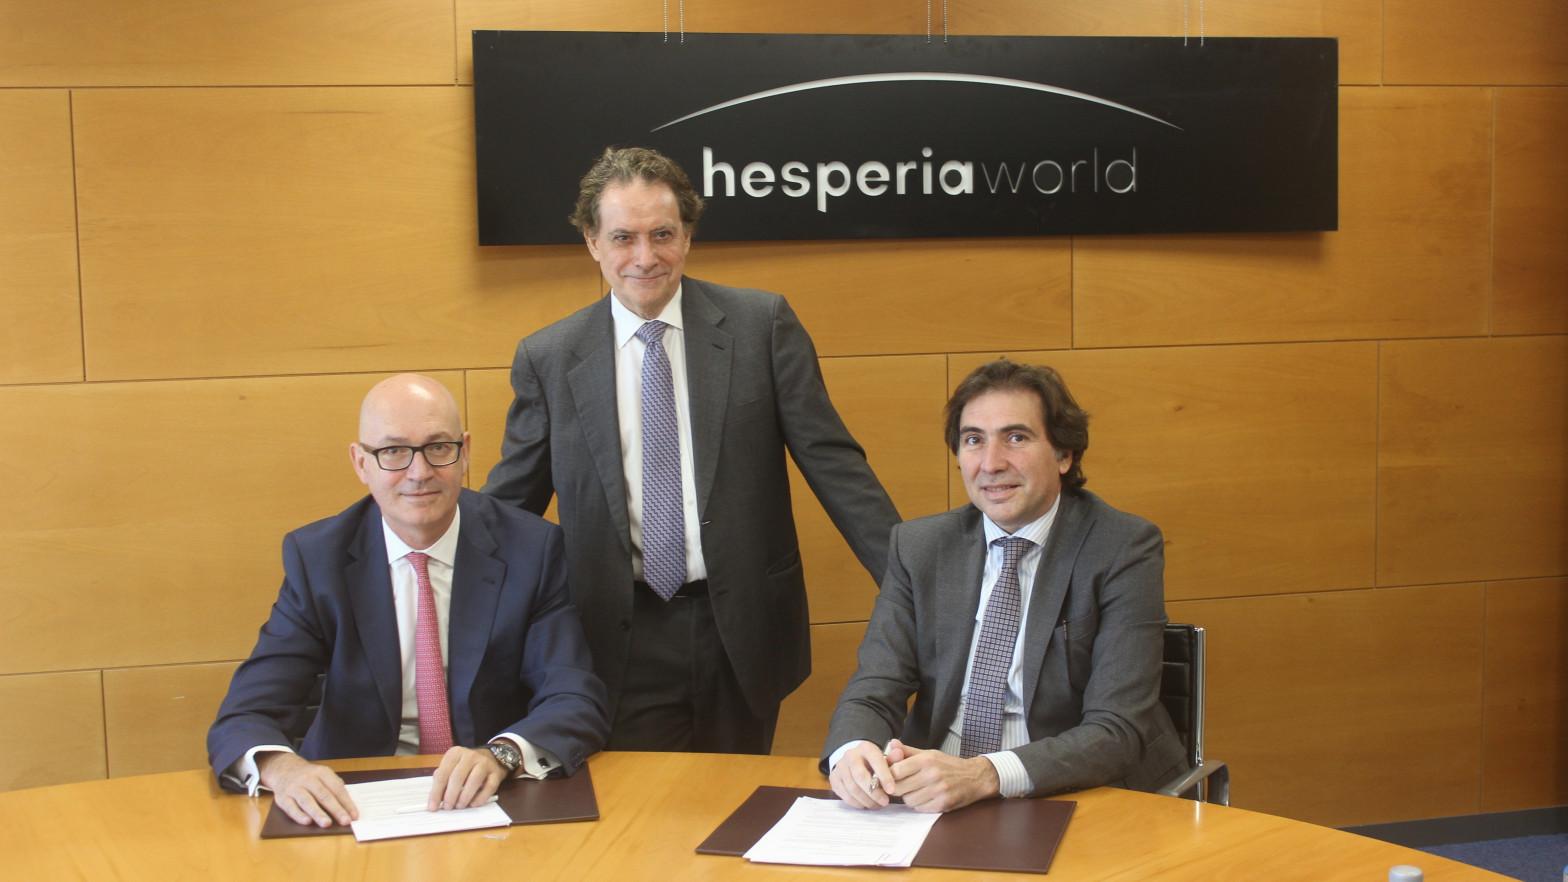 Hesperia pide 55 millones de euros a la SEPI tras el desplome del turismo